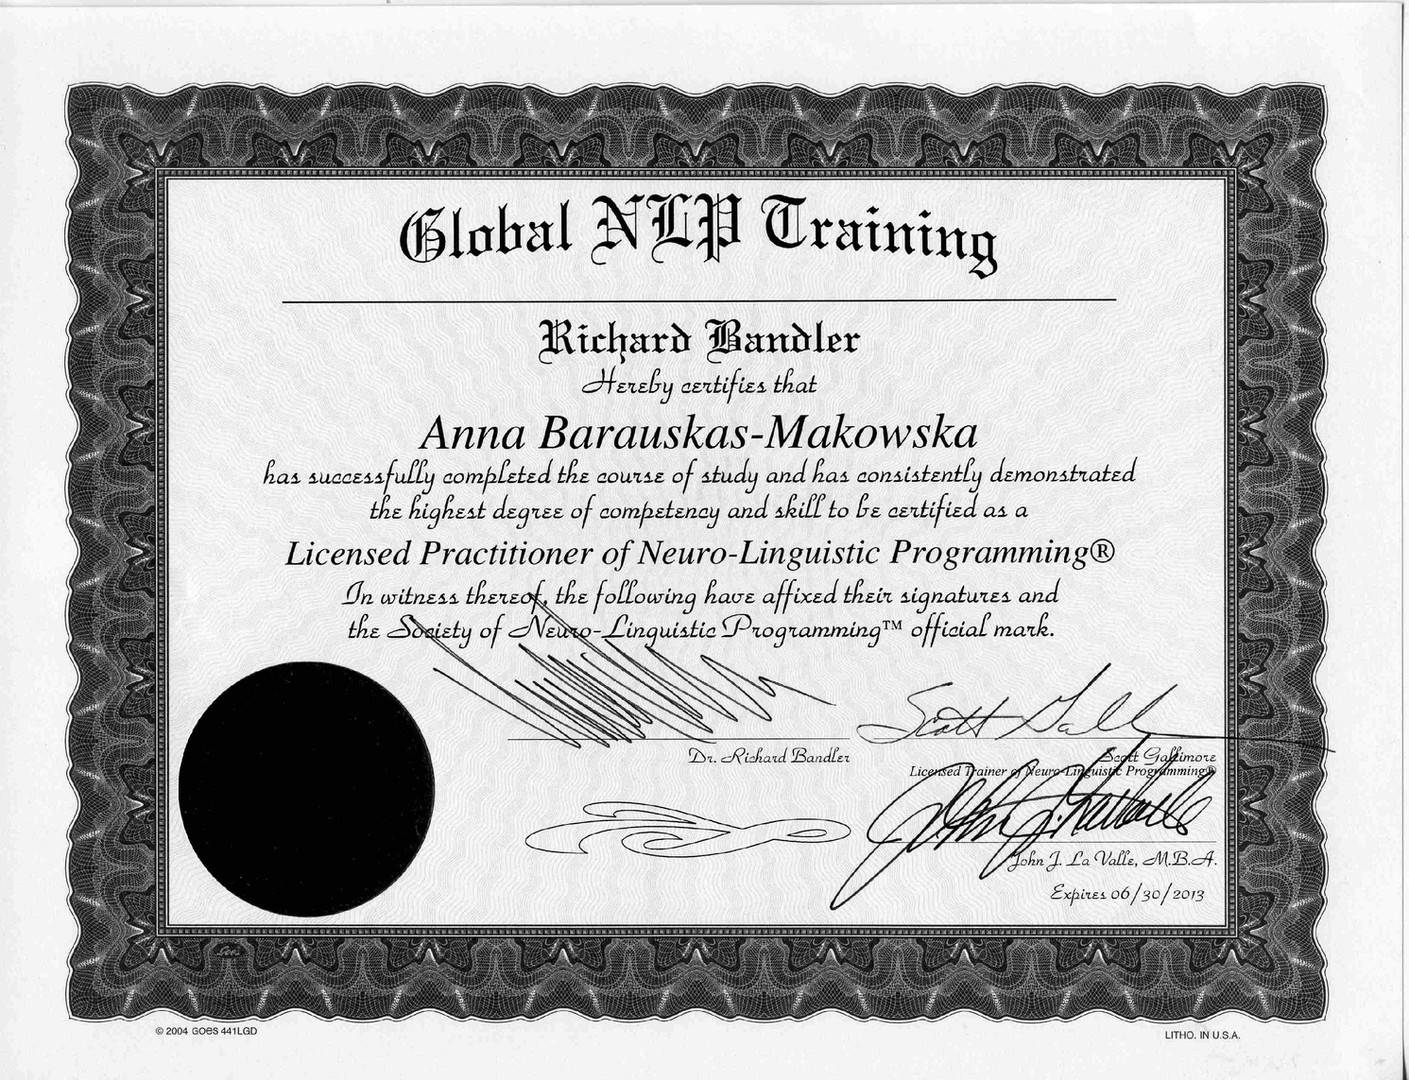 Licensed Practitioner of NLP